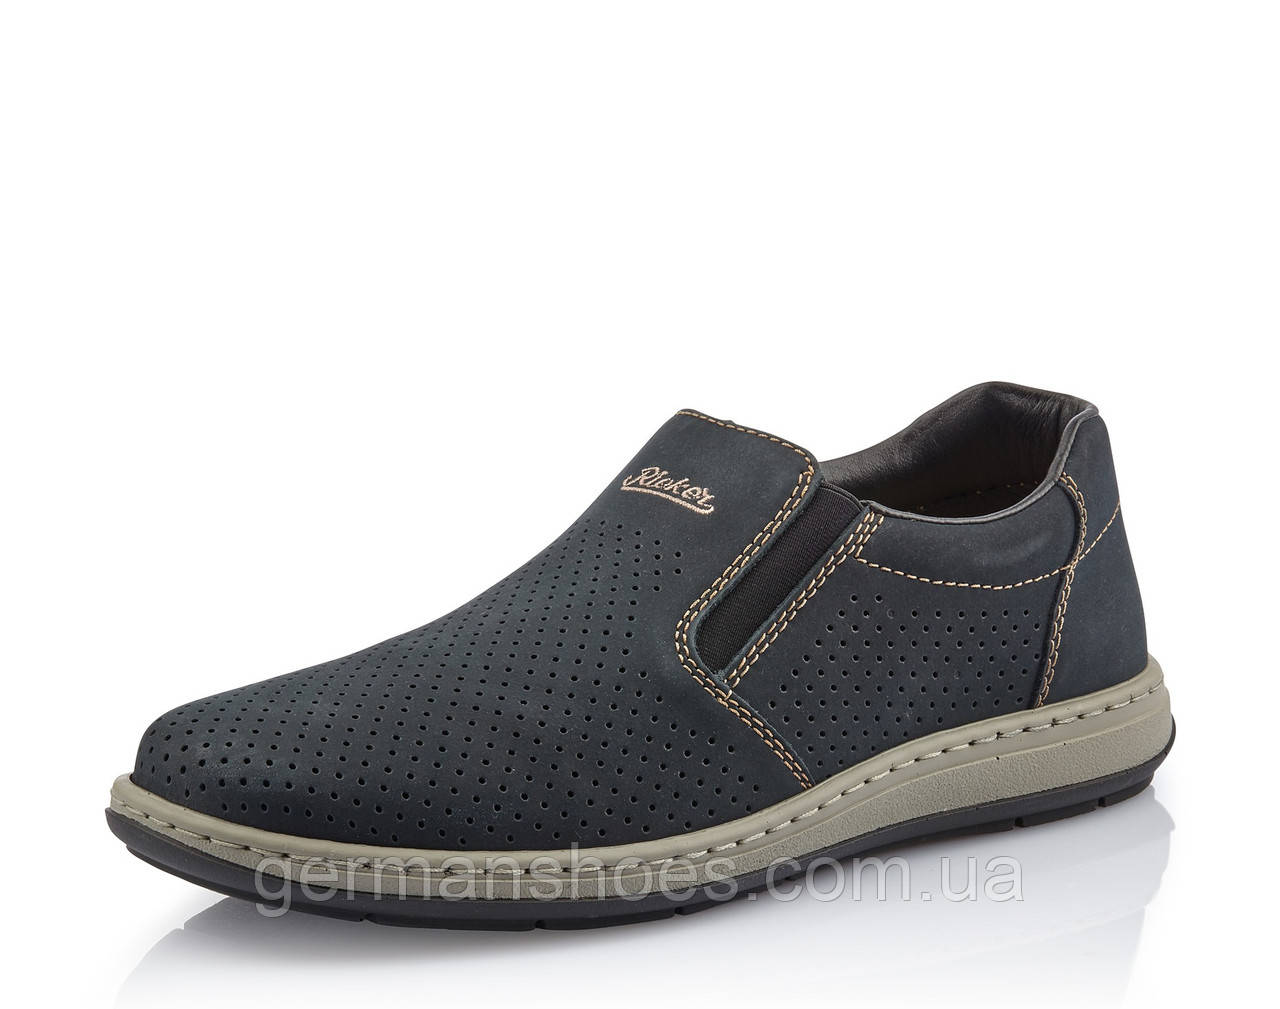 53a6d40f1 Туфли мужские Rieker 17366-14 - Интернет-магазин обуви